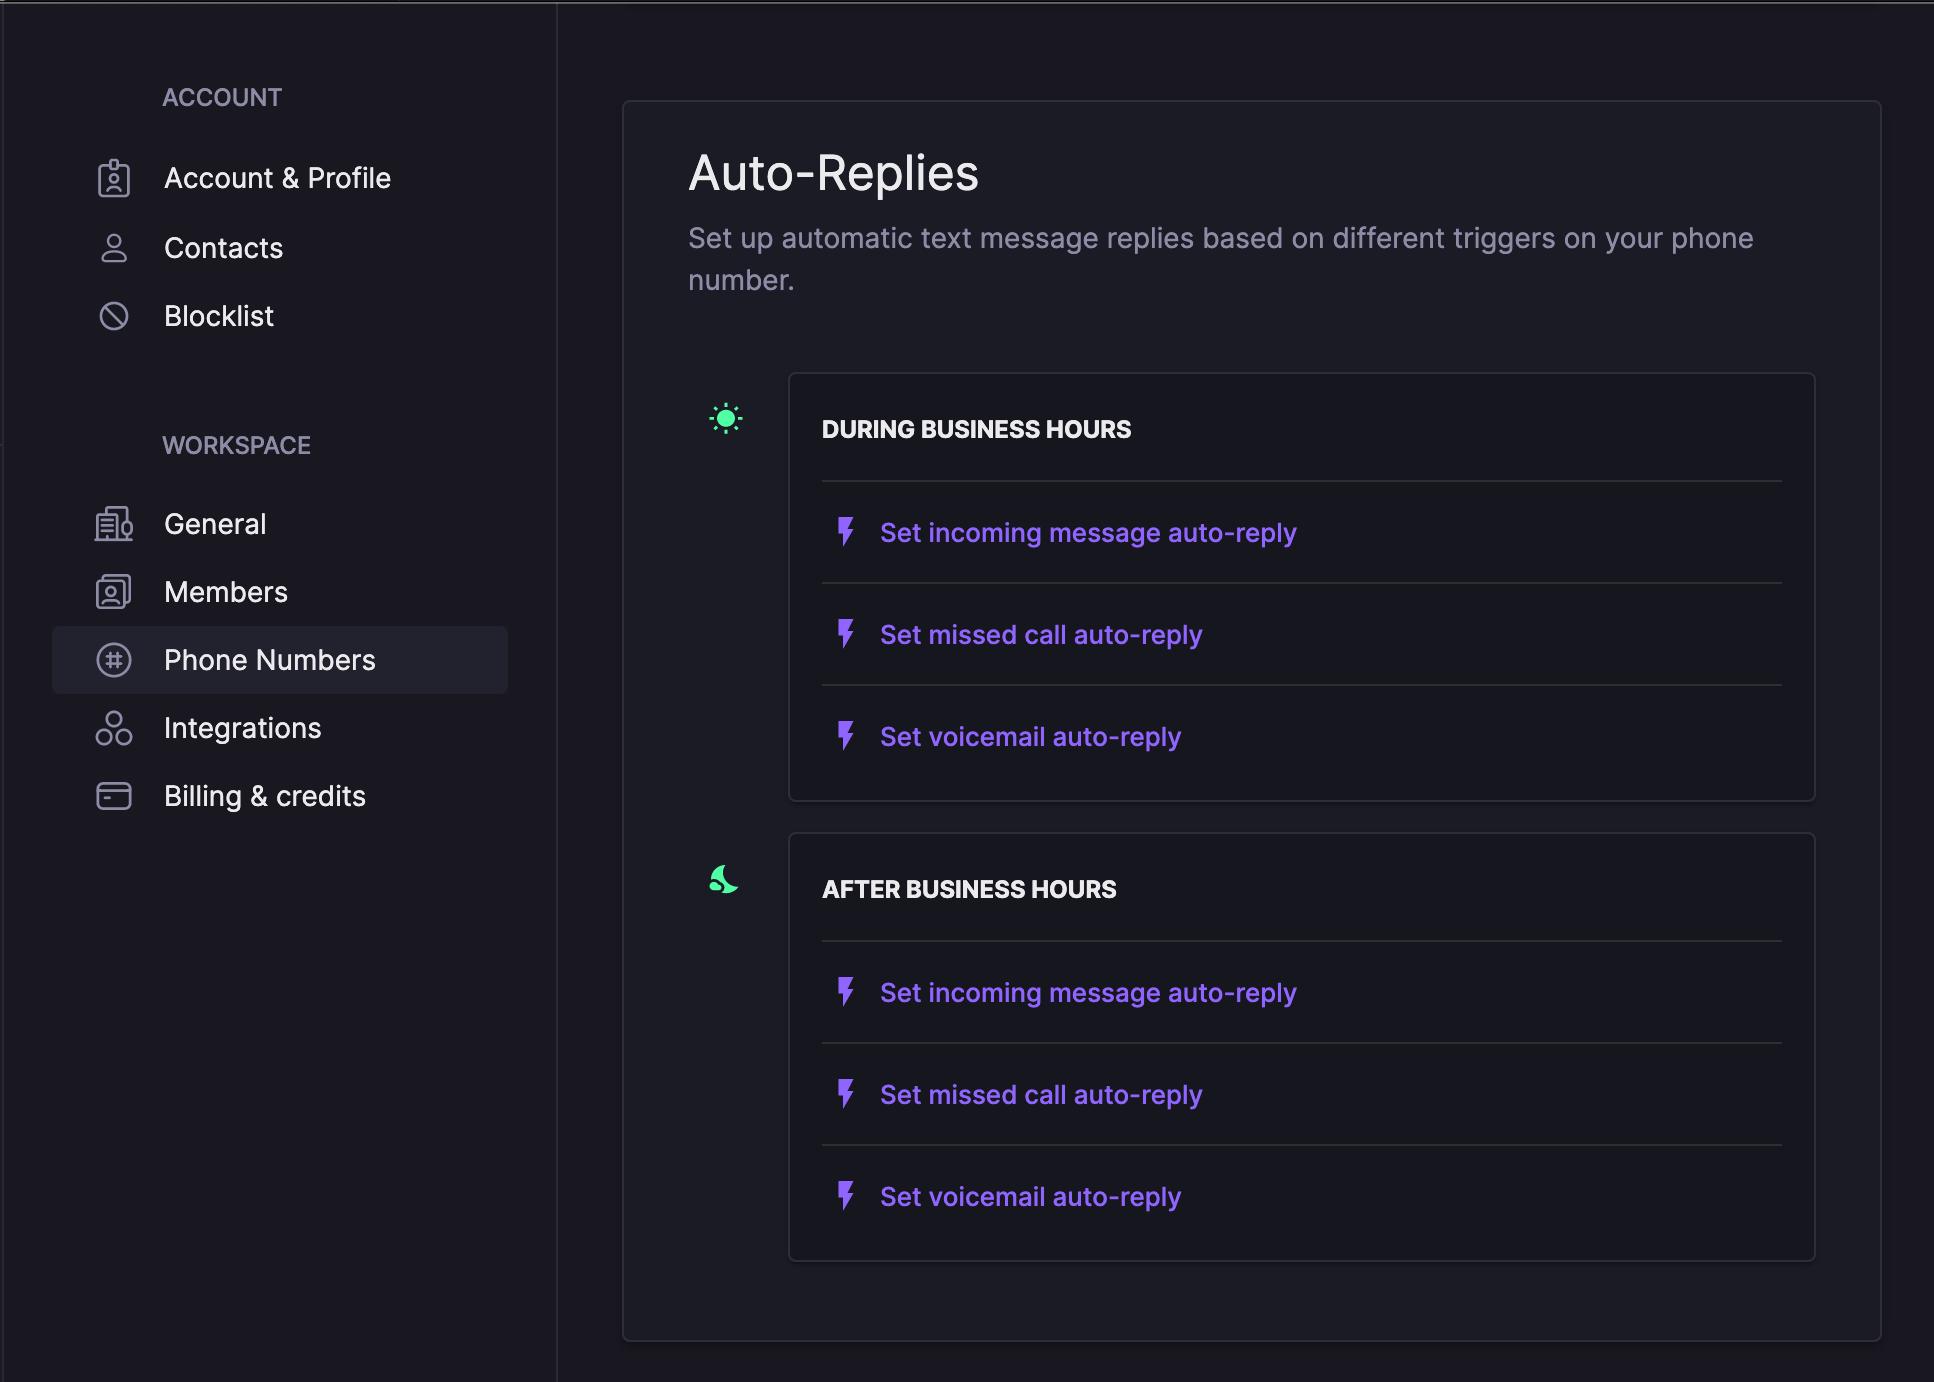 The auto-replies menu in OpenPhone